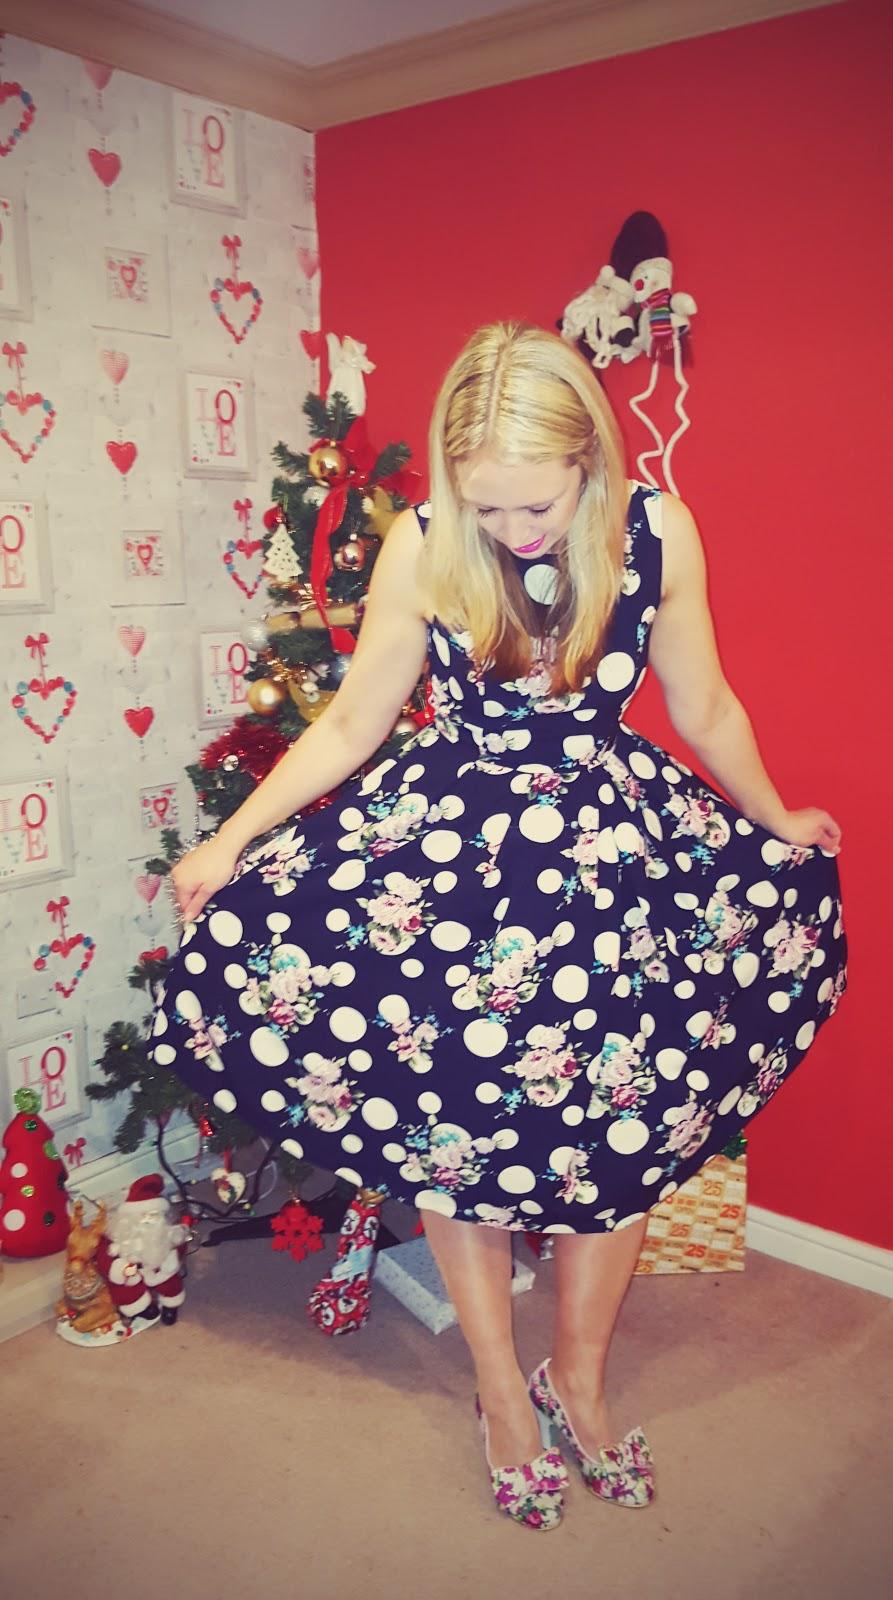 Rockin Around The Christmas Tree In A Polka Dot Dress...